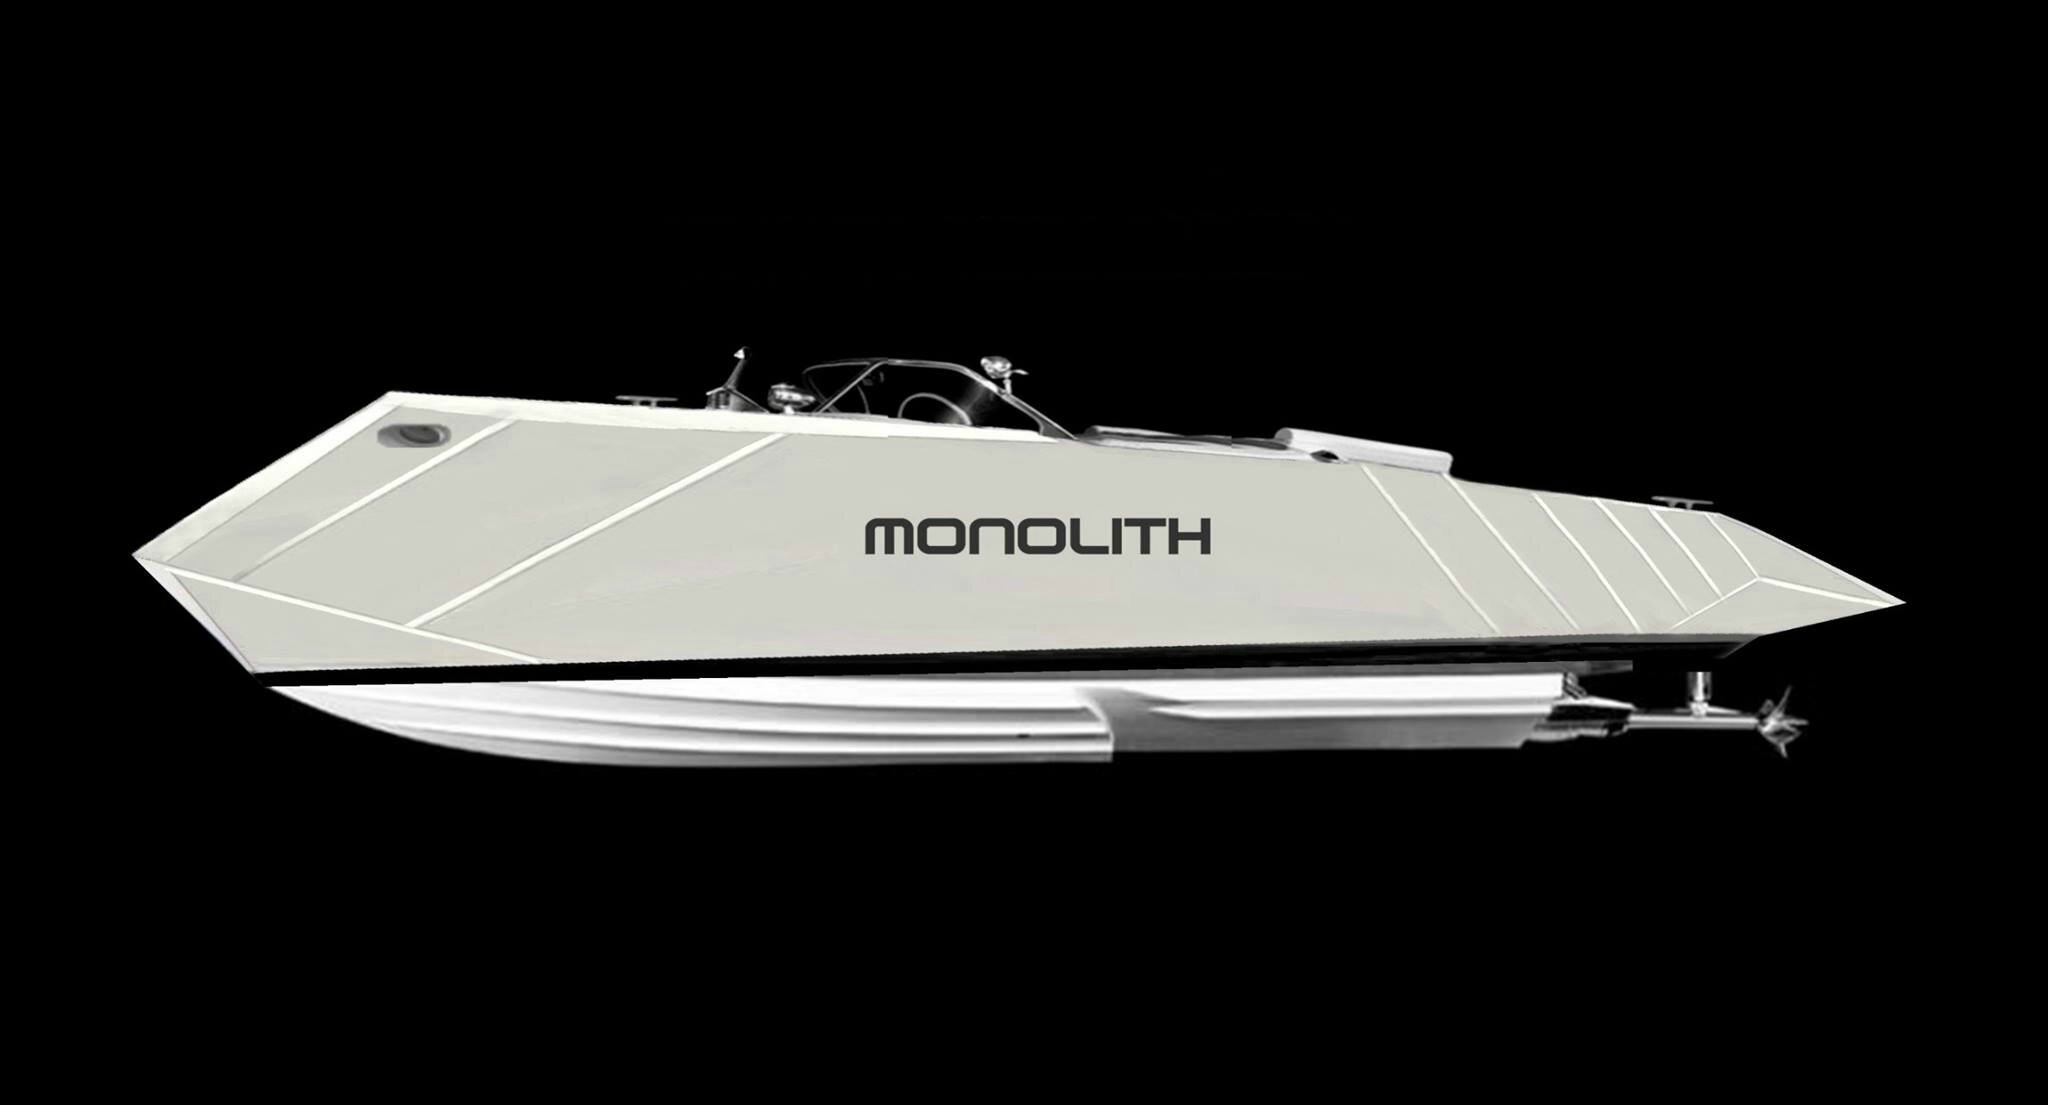 speed boat, boat design, motor boat design, motor boat concept, yacht design, yacht concept, boat designer, yacht designer, jeune designer, designer français, boat concept, boatdesign, powerboat design, powerboat concept,